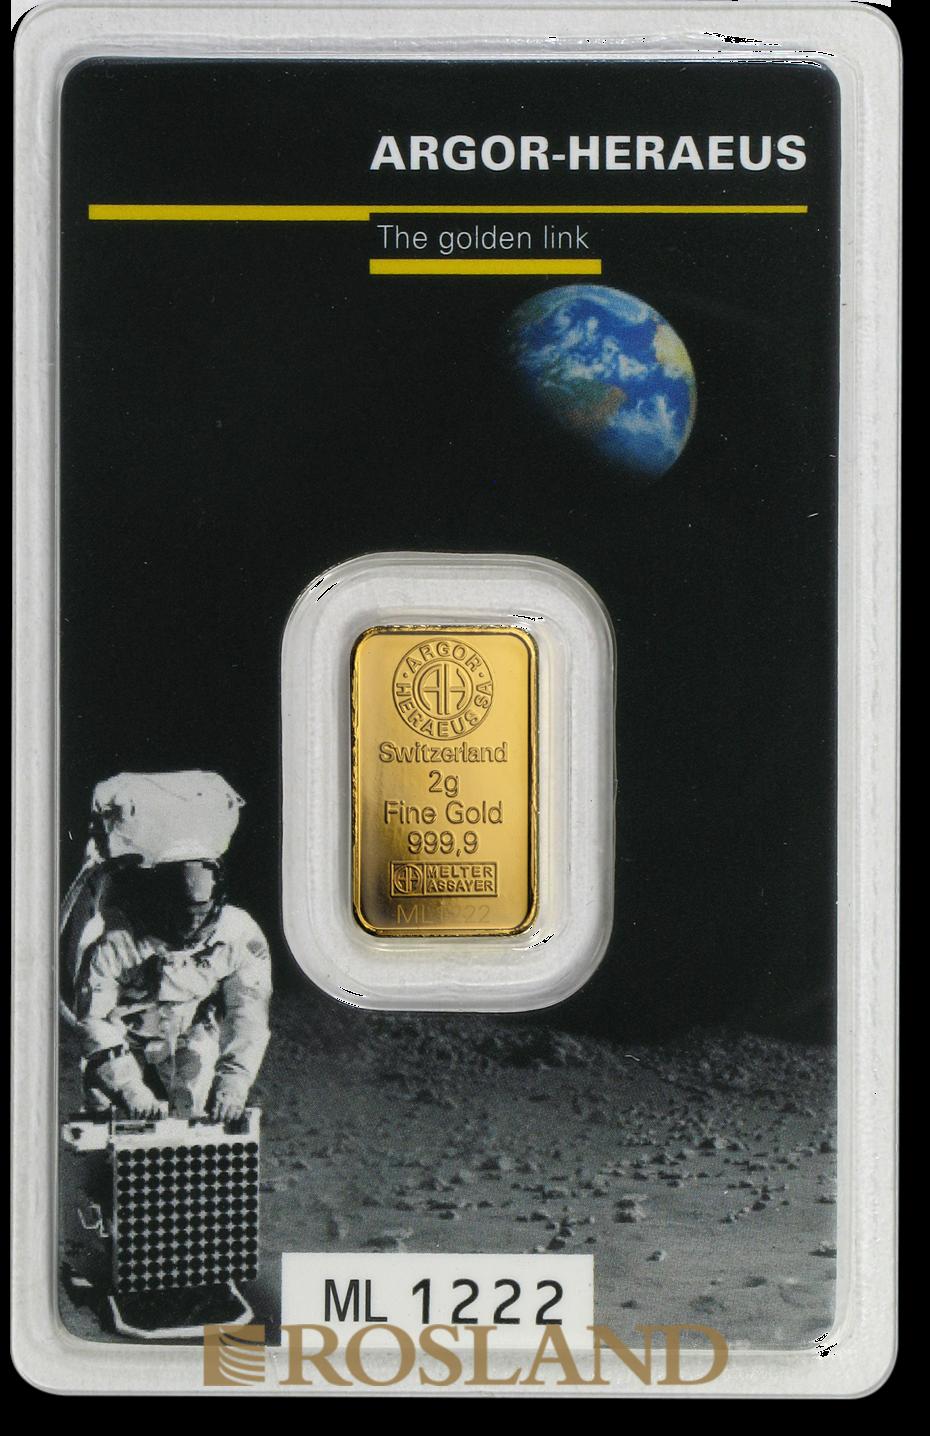 2 Gramm Goldbarren Heraeus Argor Apollo 11 Mondlandung